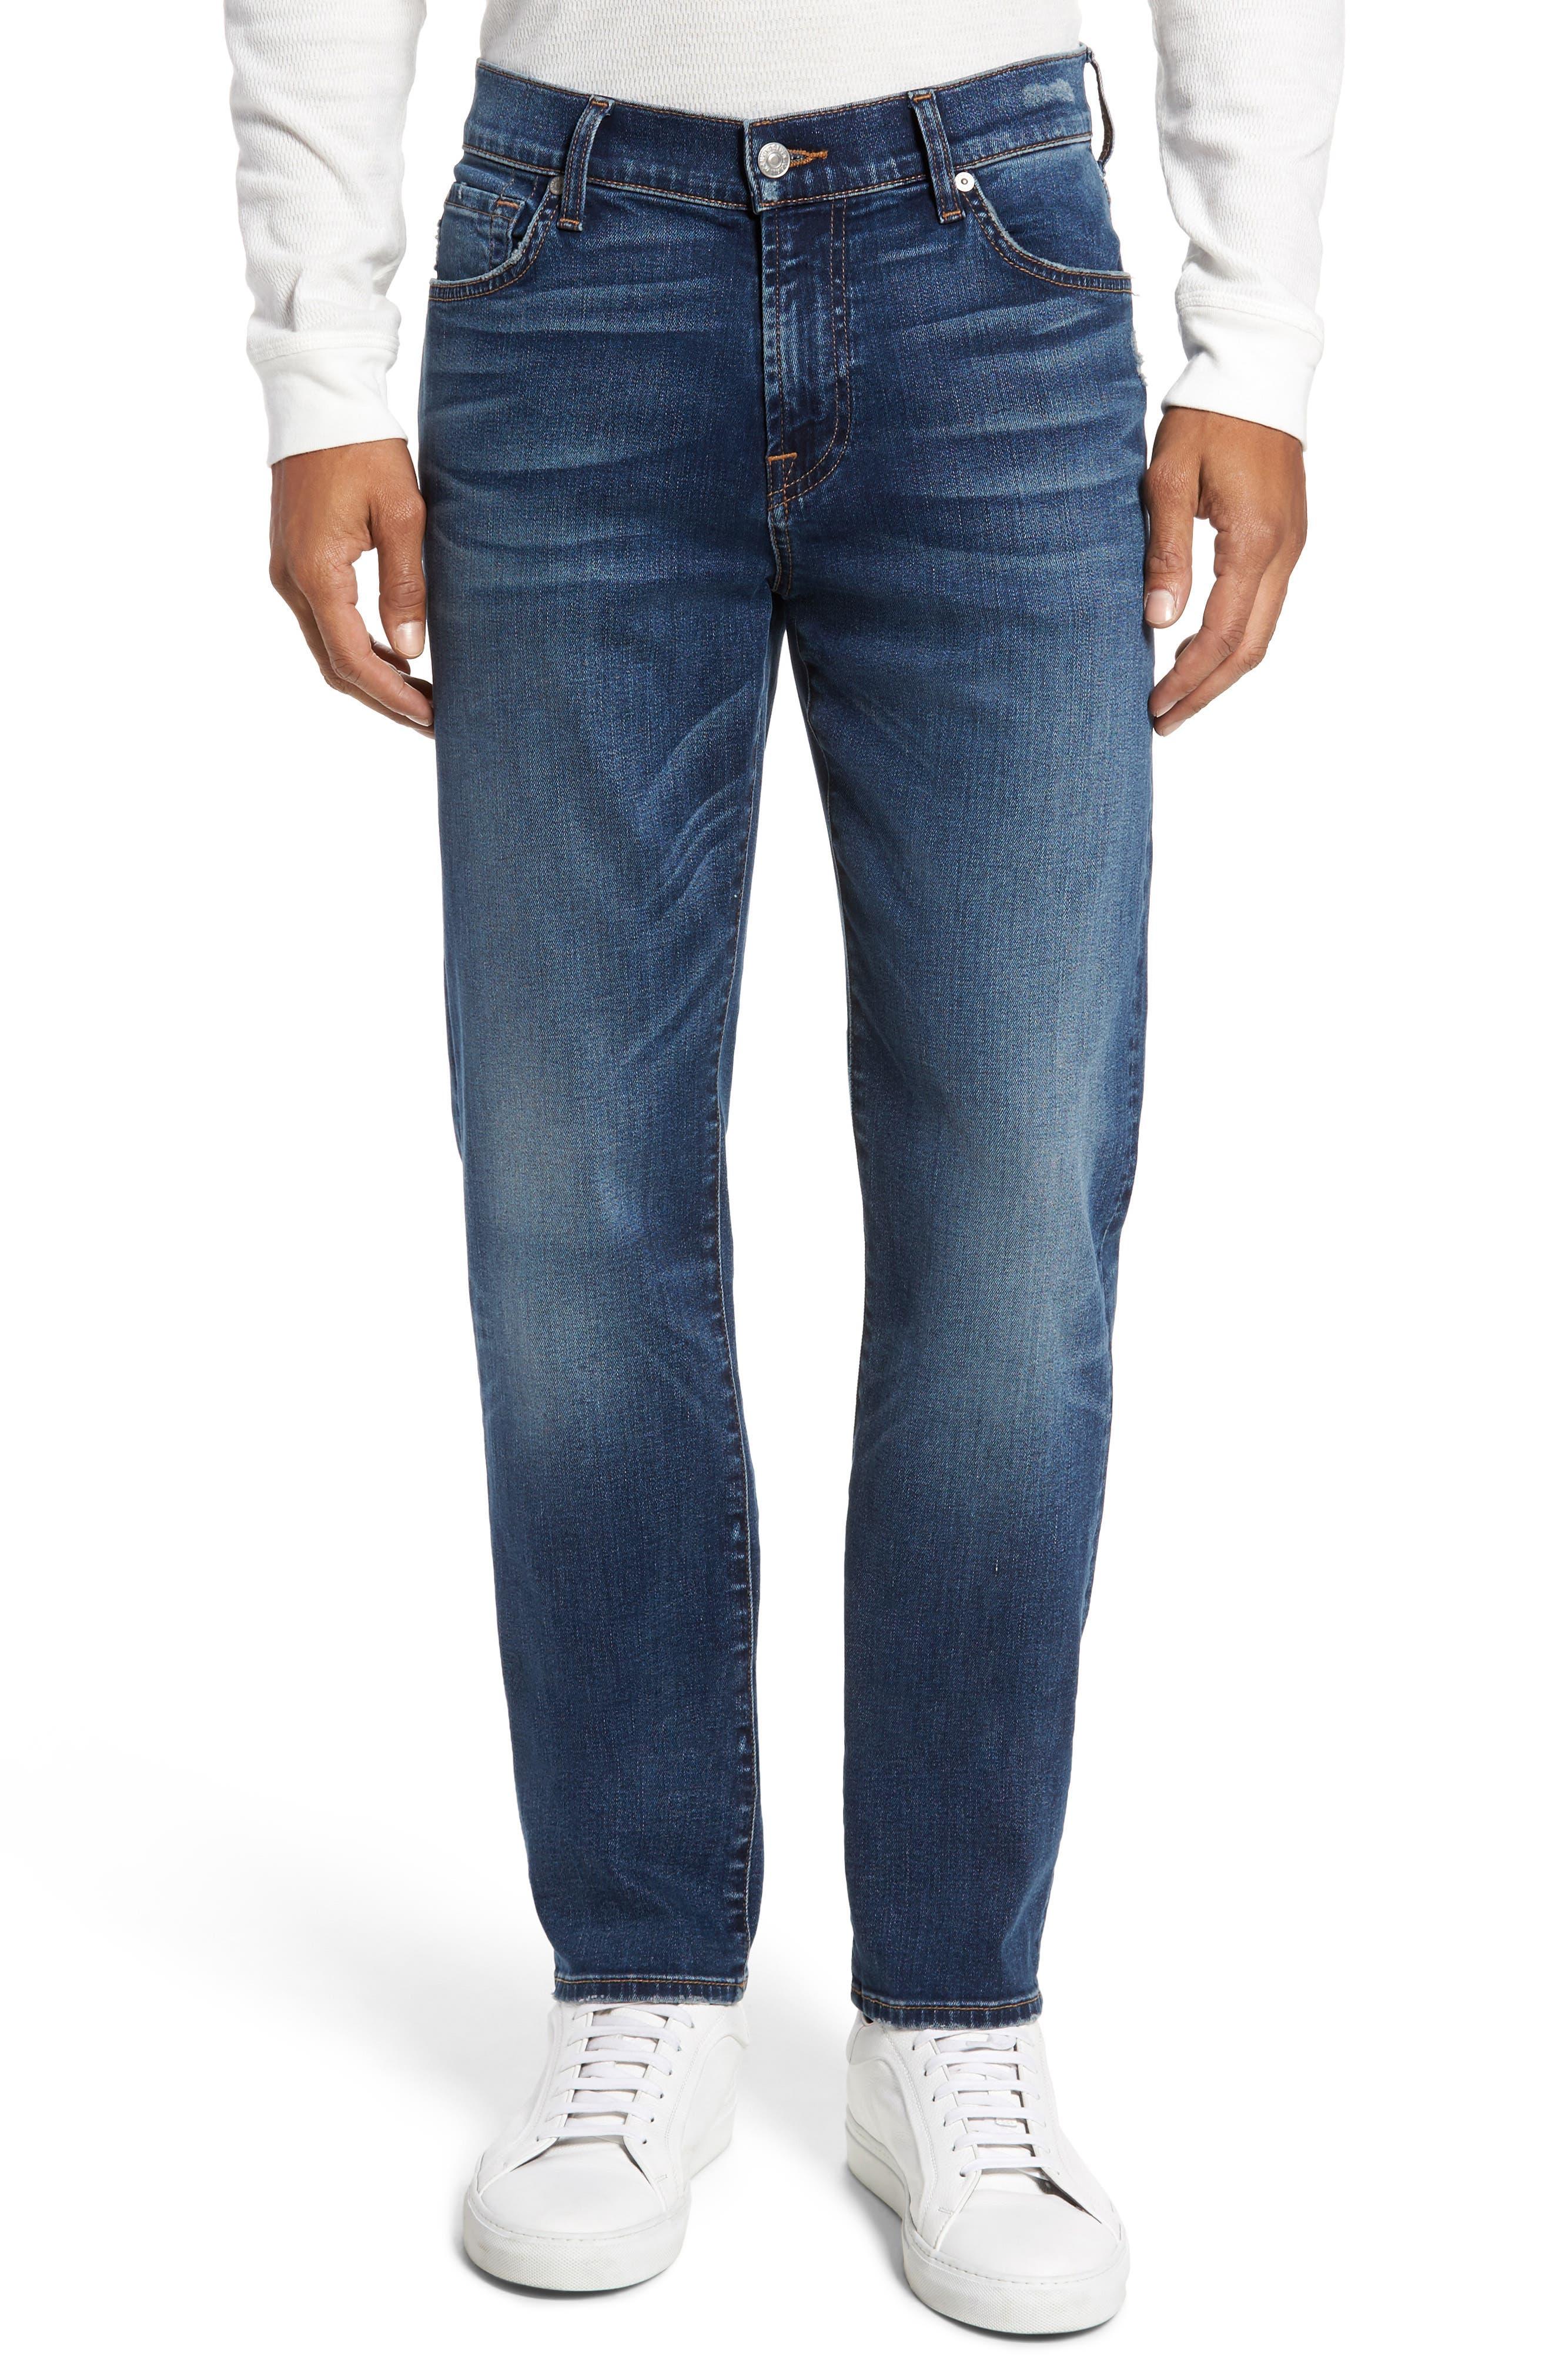 Slimmy Slim Fit Jeans,                         Main,                         color, 407